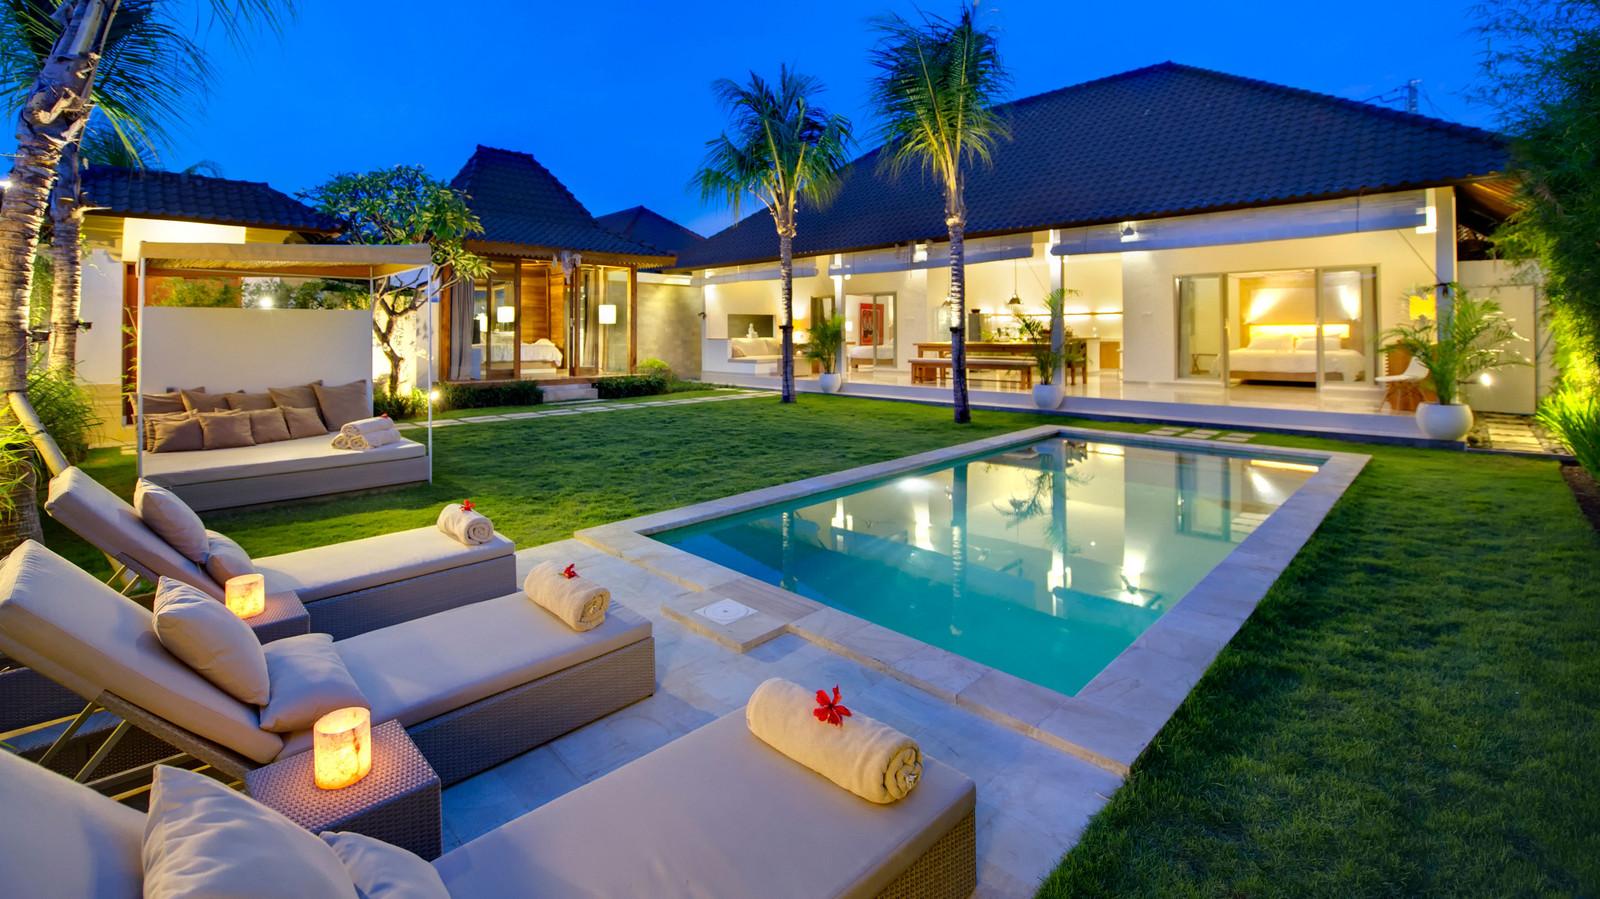 Luxuryhousewonderfulwithimagesoflux